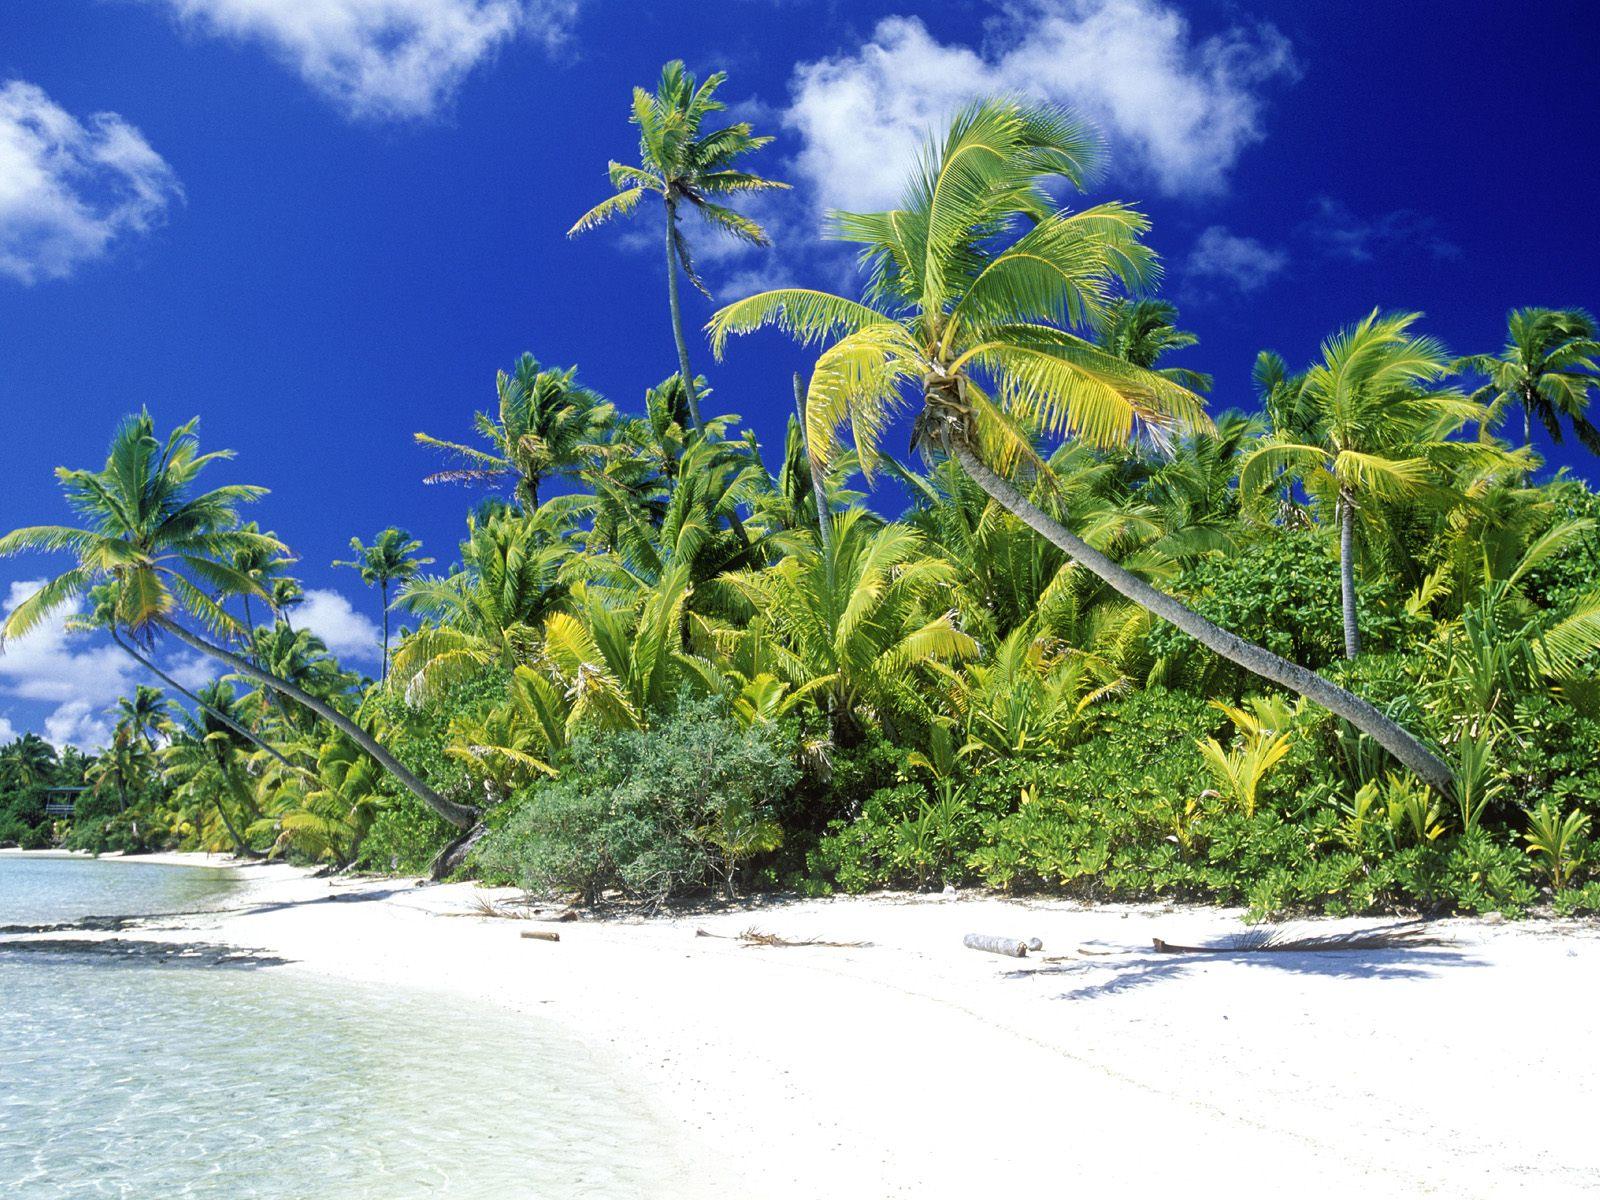 Wallpaper Of Beach Palm Beach With Pretty Palms Wallpaper 1600x1200